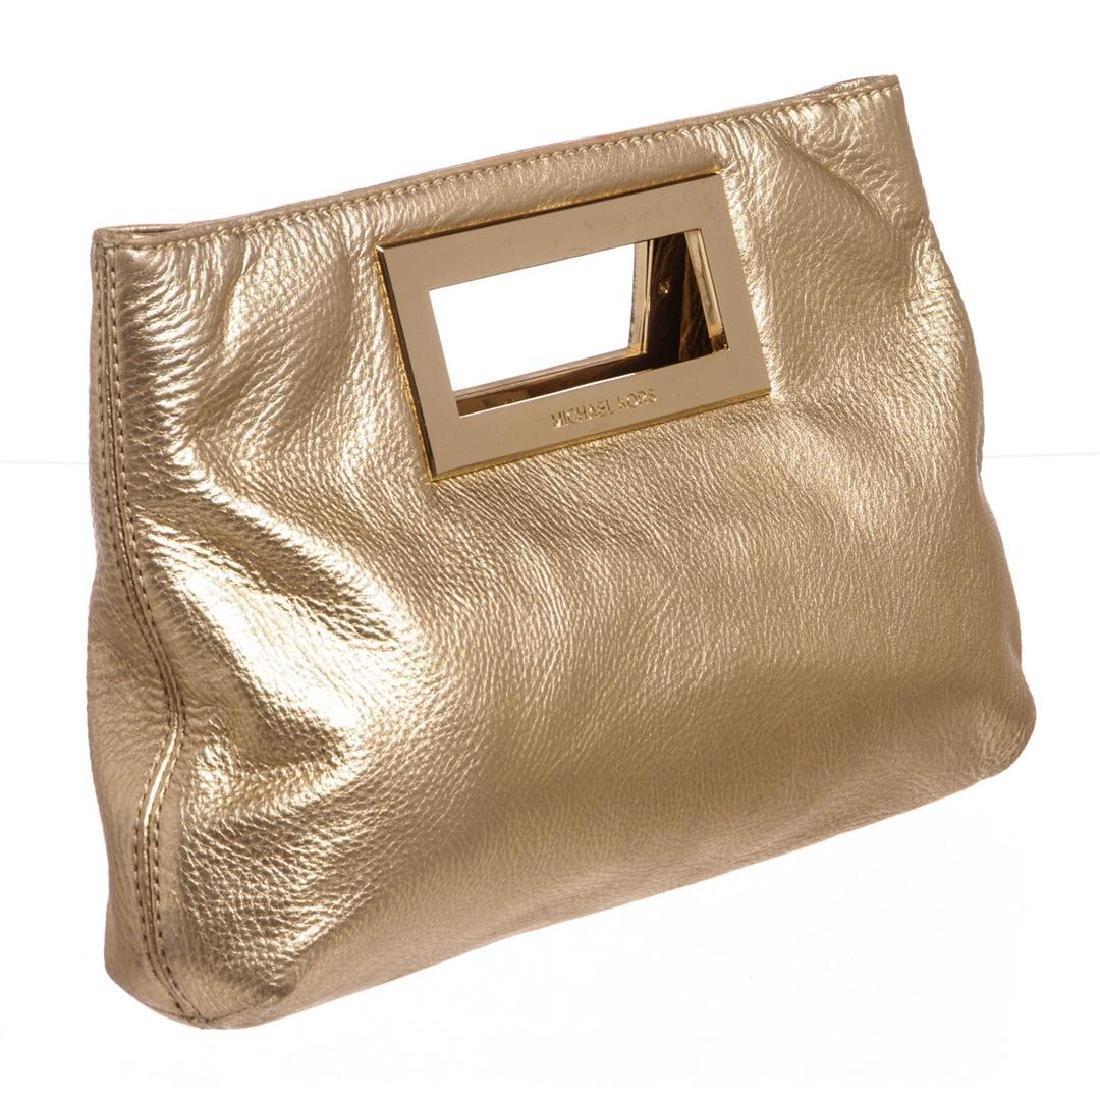 Michael Kors Pale Gold Leather Berkley Clutch Handbag - 2